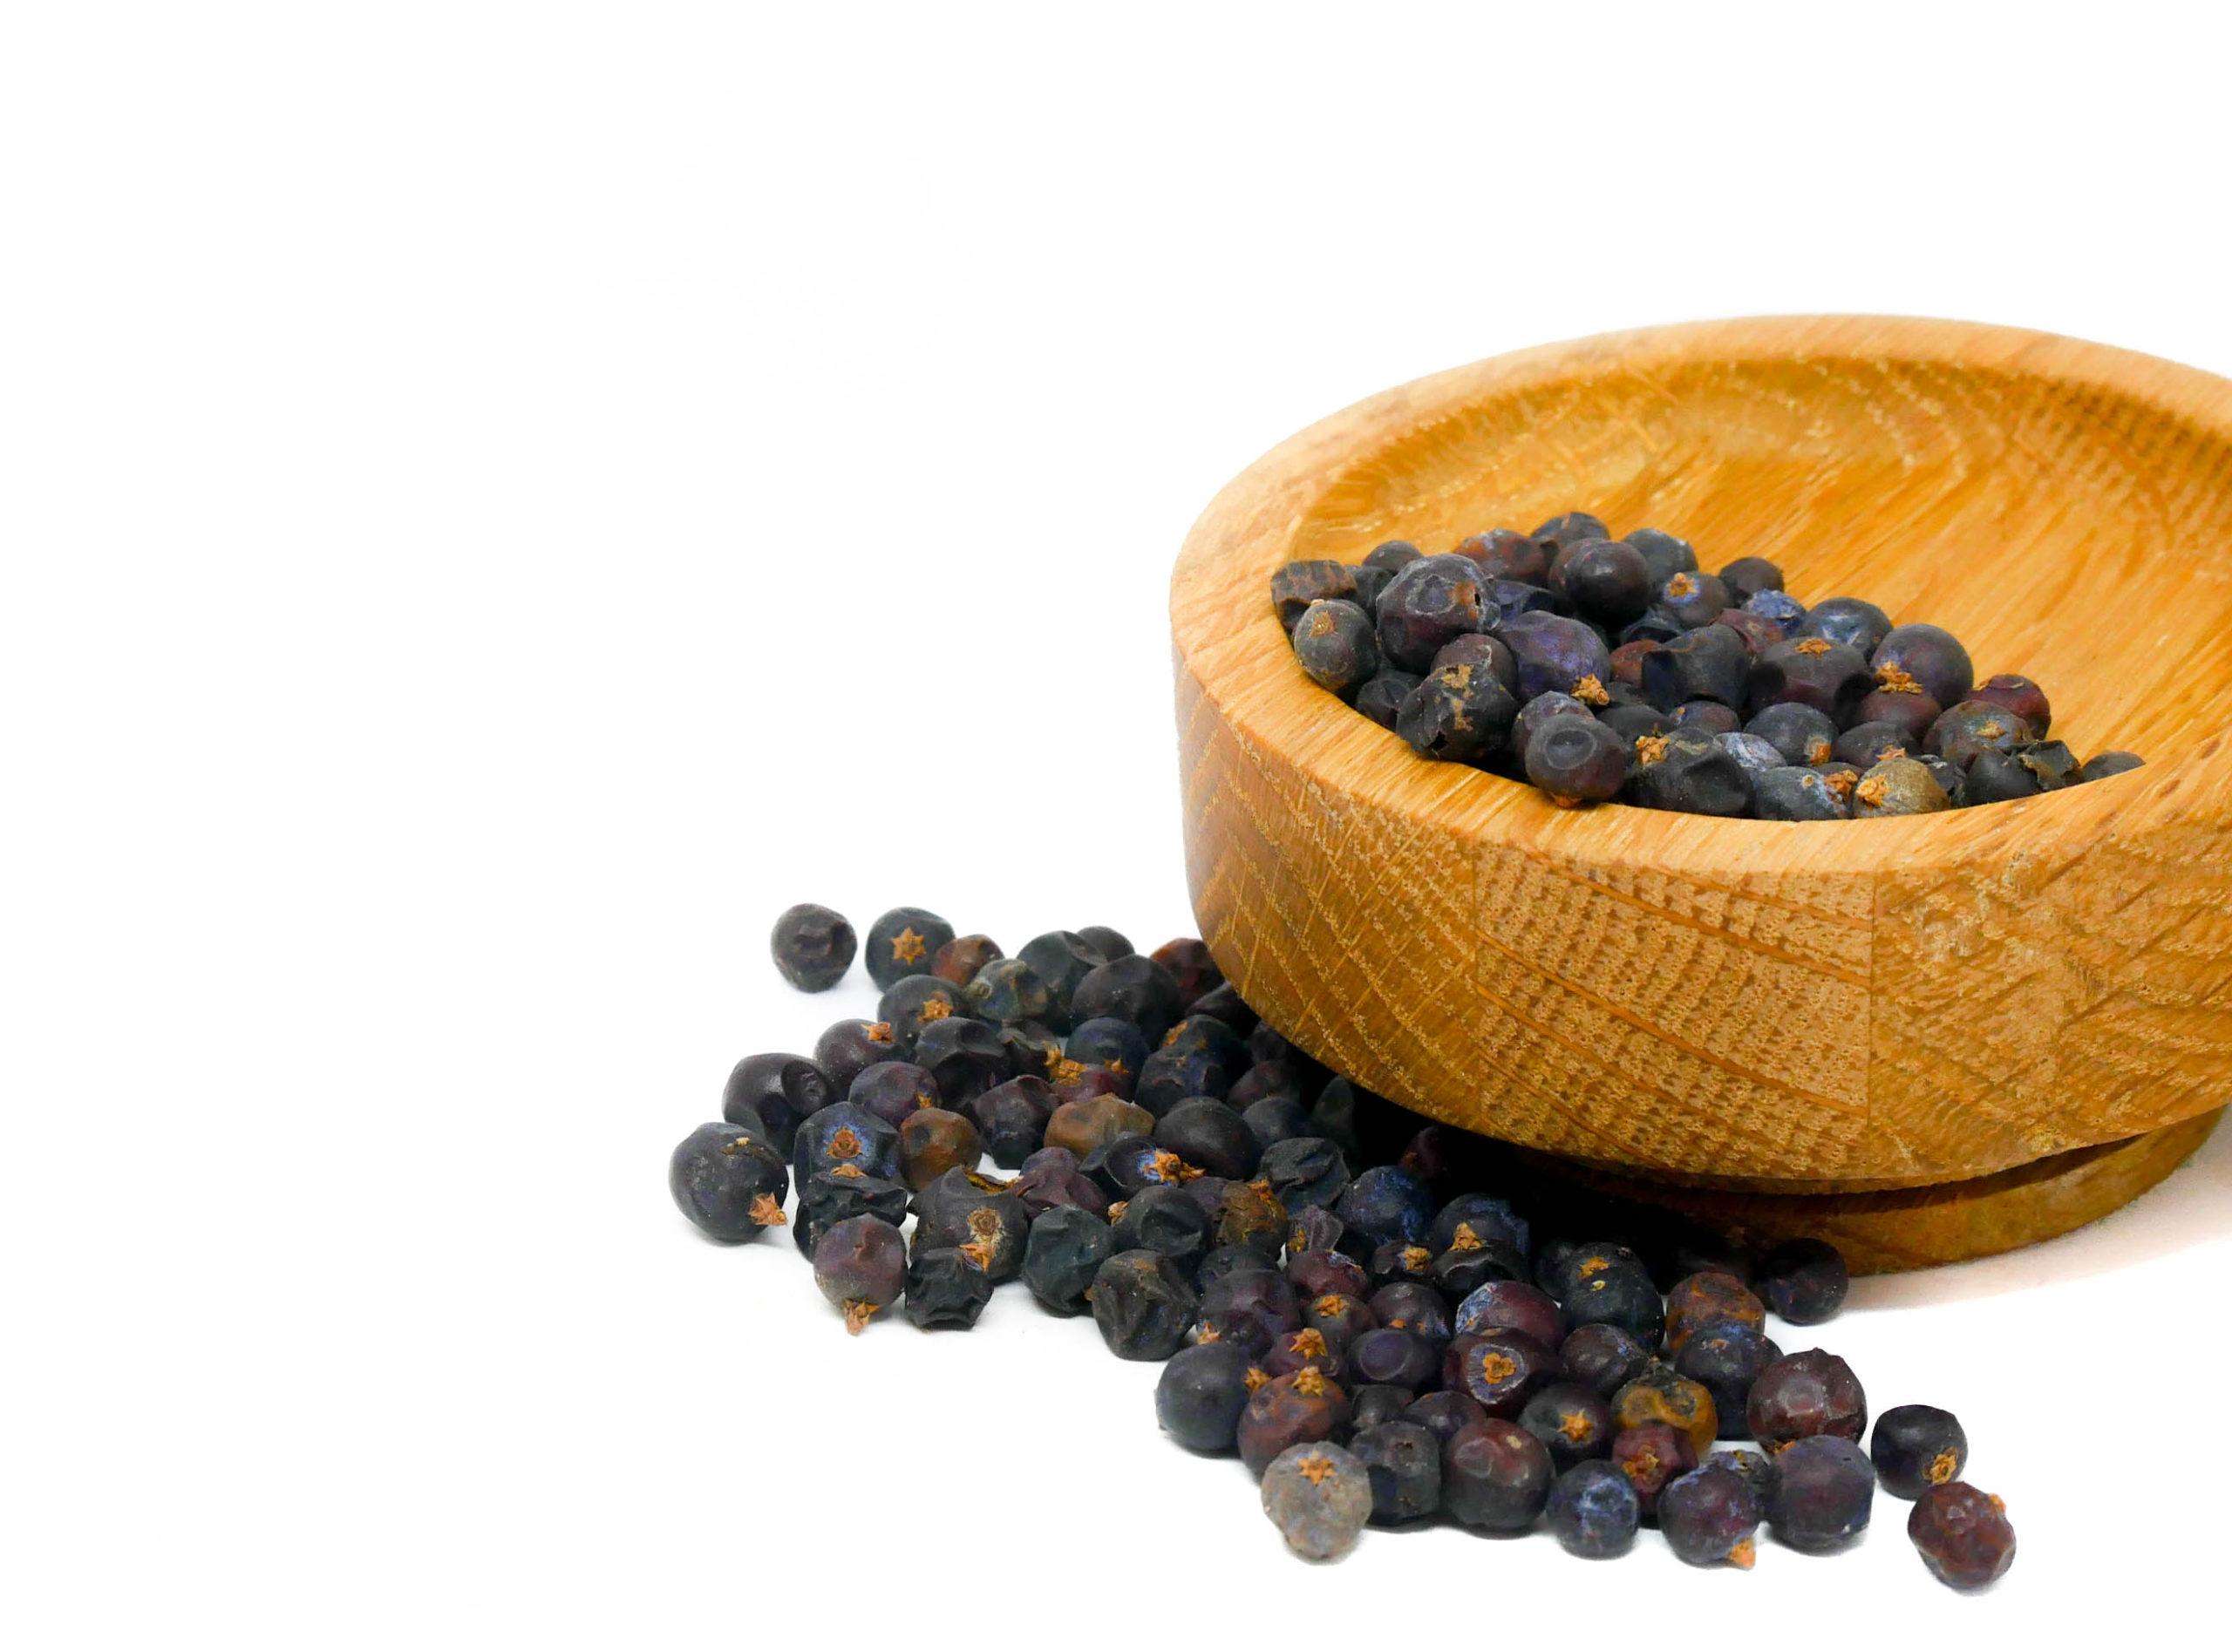 Juniper Berry from the Natural Spot